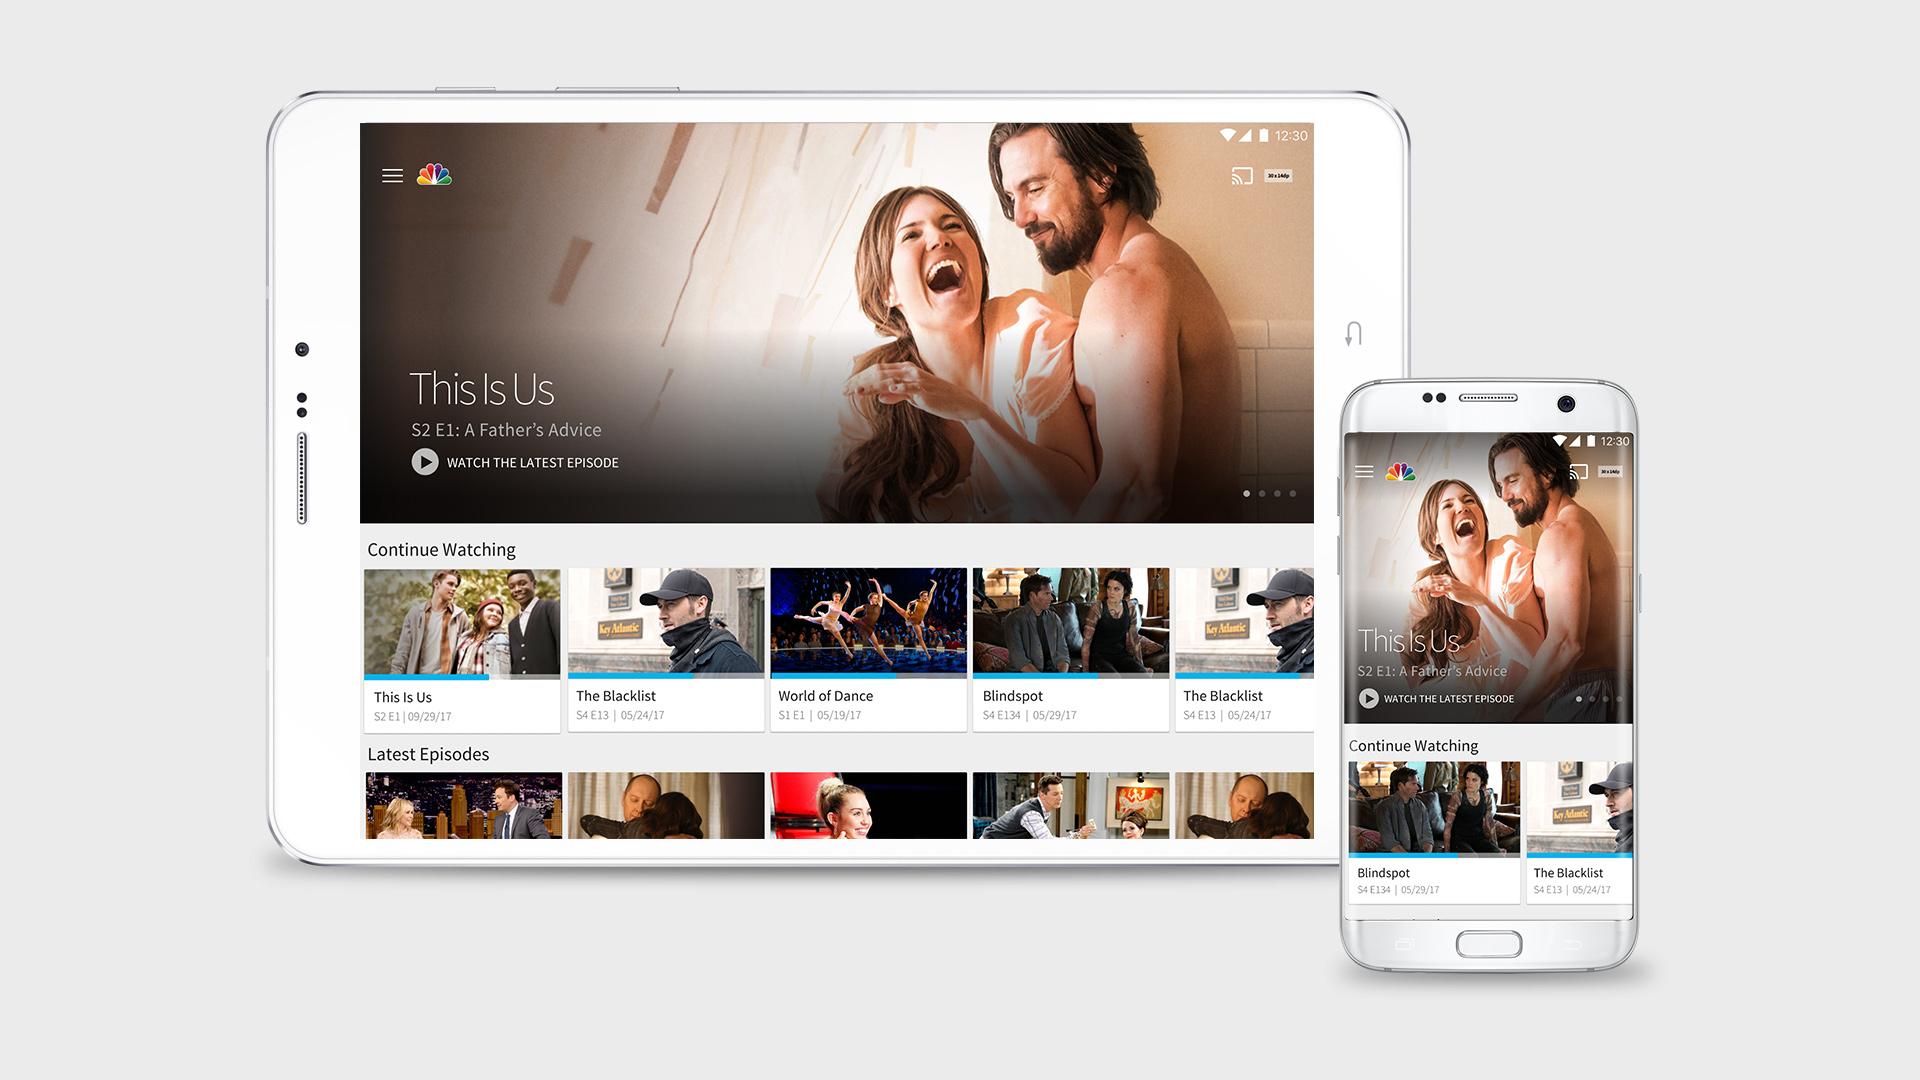 activate nbc app on samsung tv